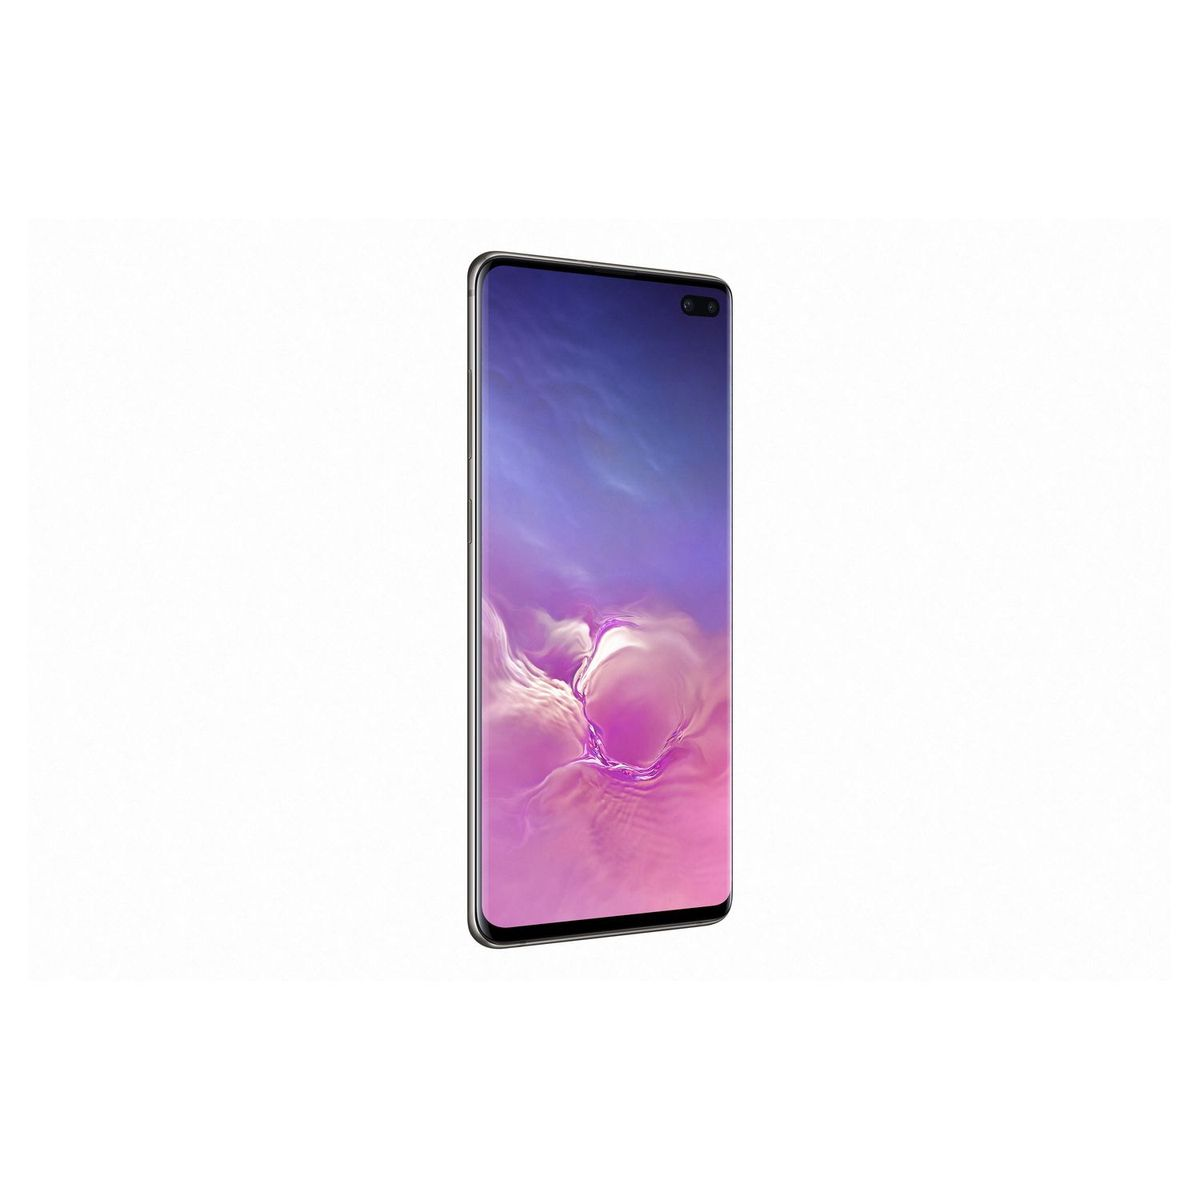 SAMSUNG Smartphone Galaxy S10+ Performance - 512 Go - 6.4 pouces - Noir - 4G